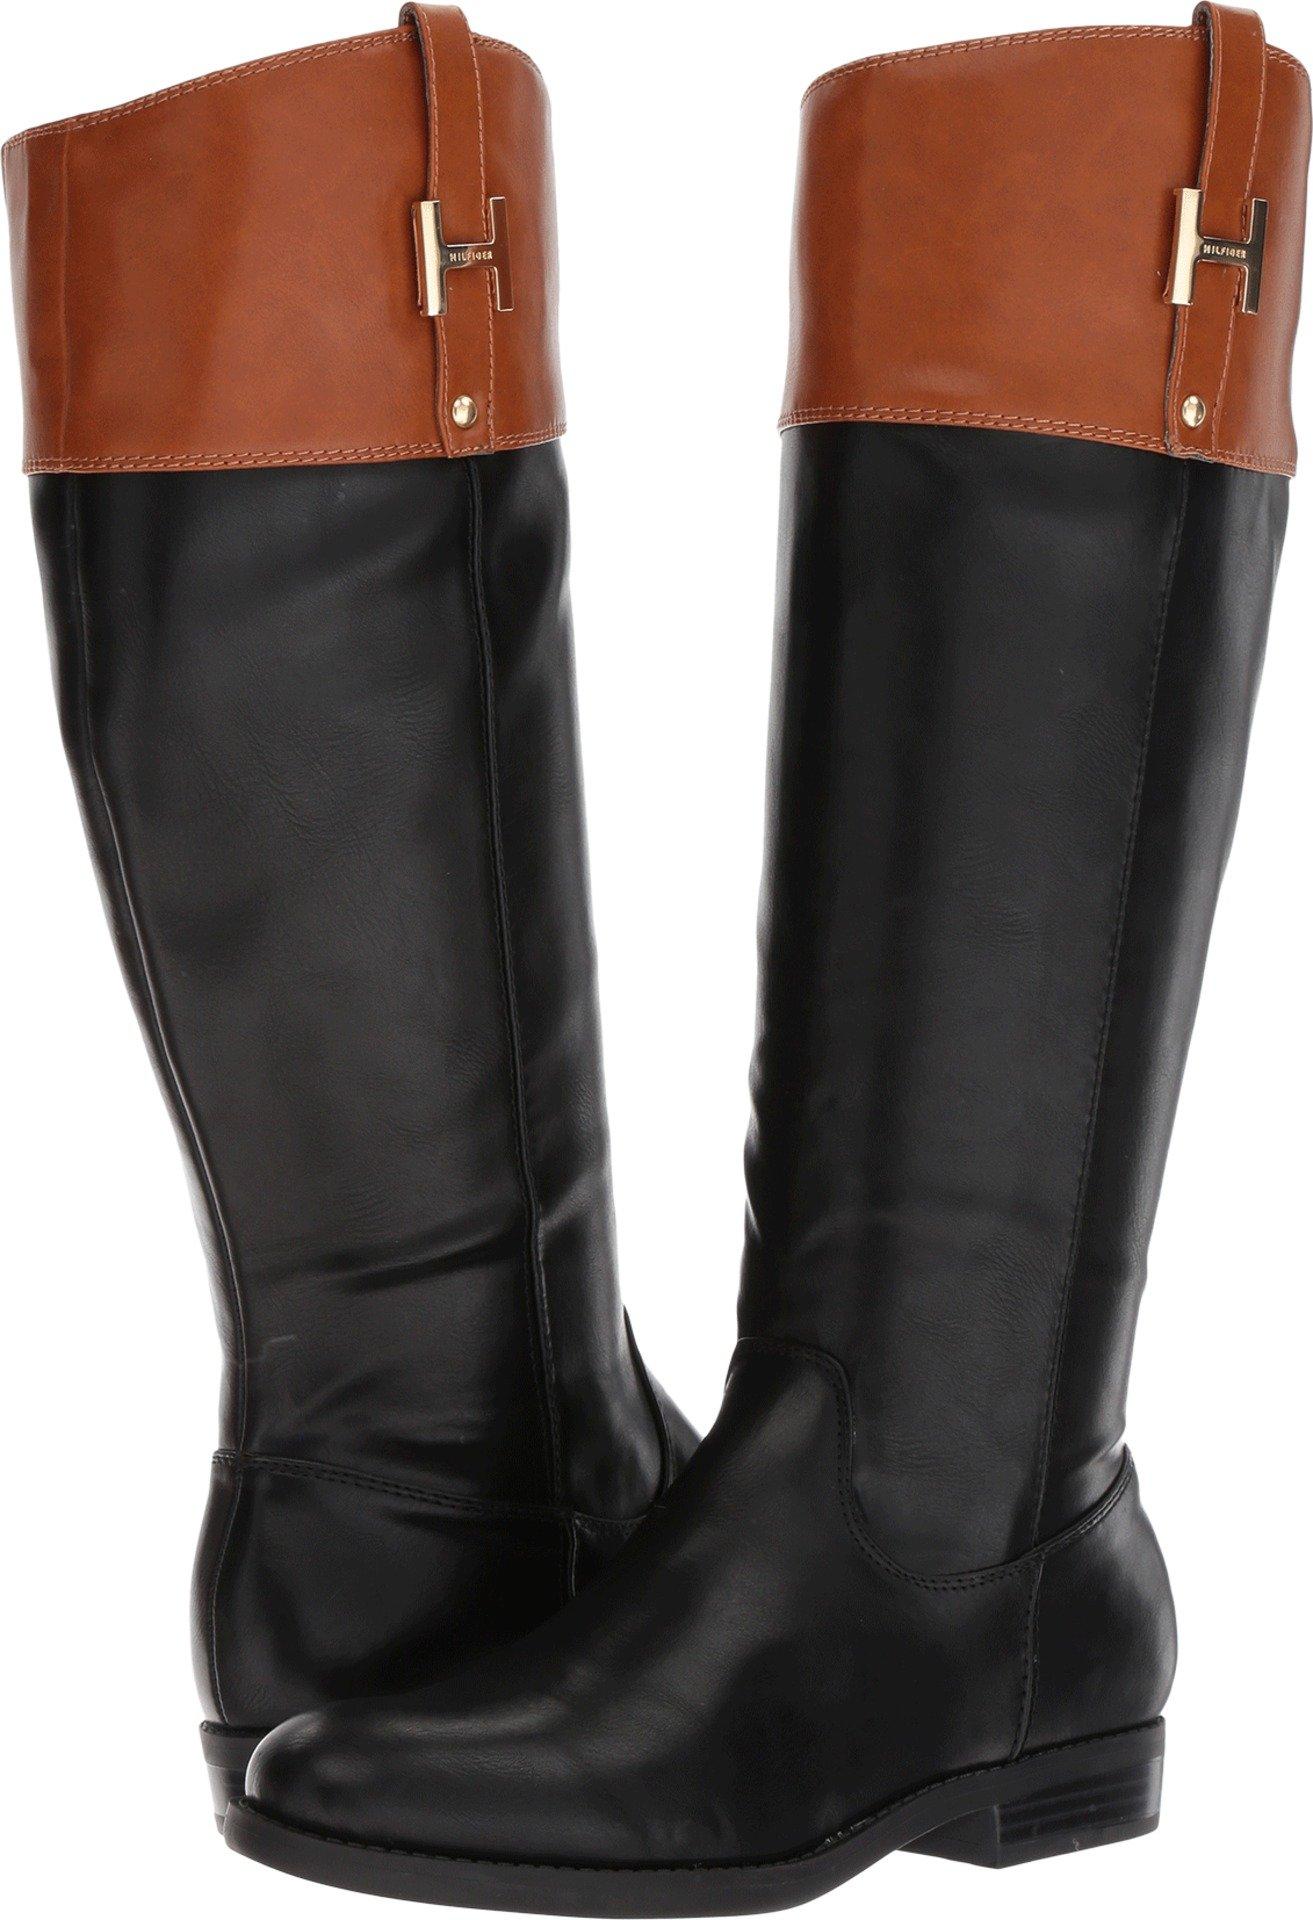 Tommy Hilfiger Women's Shyenne Equestrian Boot, Black/Cognac, 8 Medium US